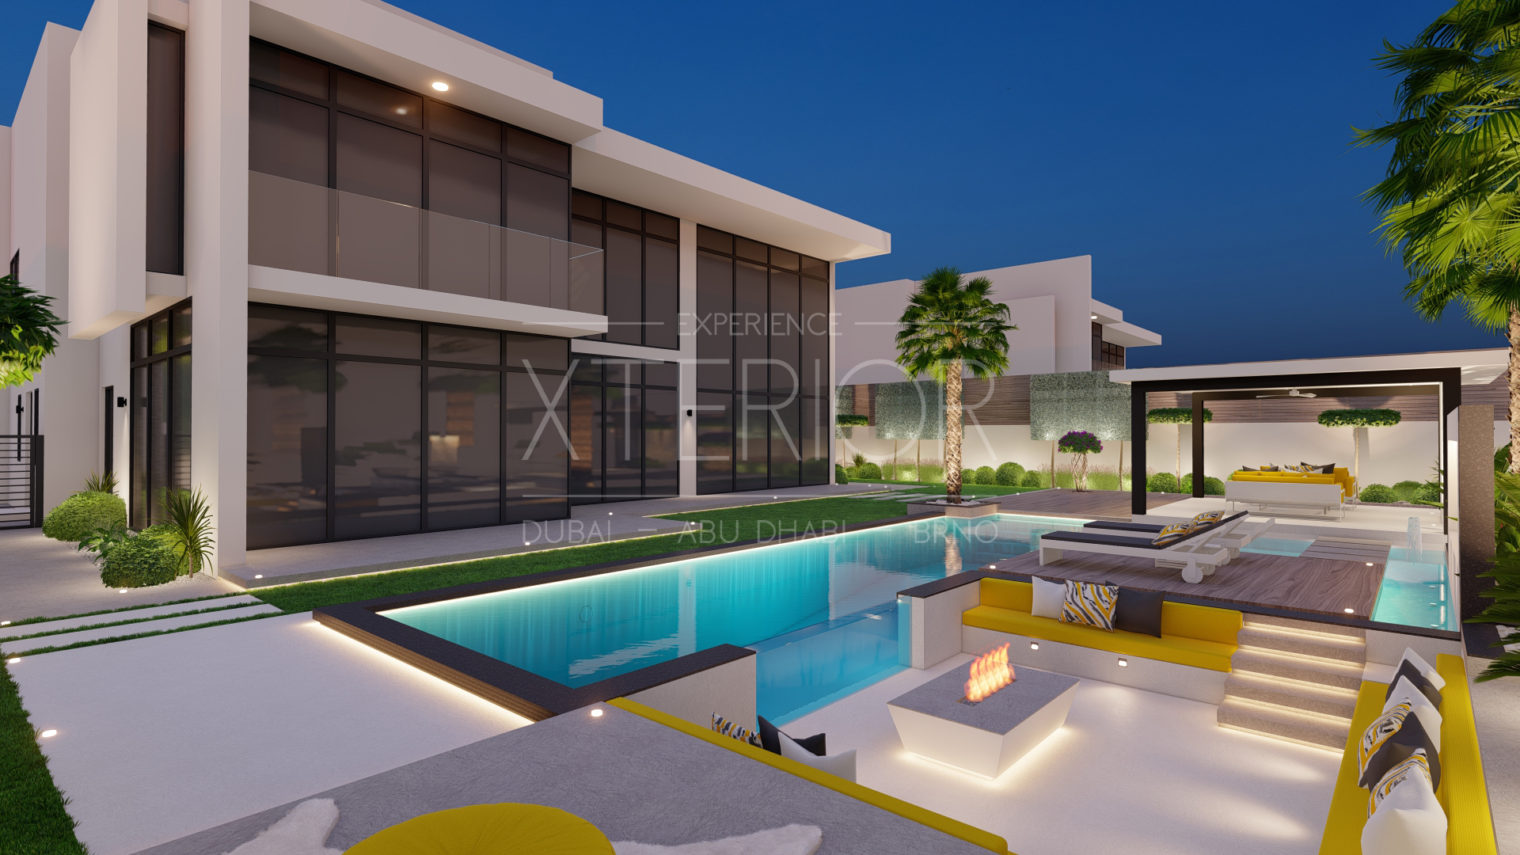 pool construction company Abu dhabi